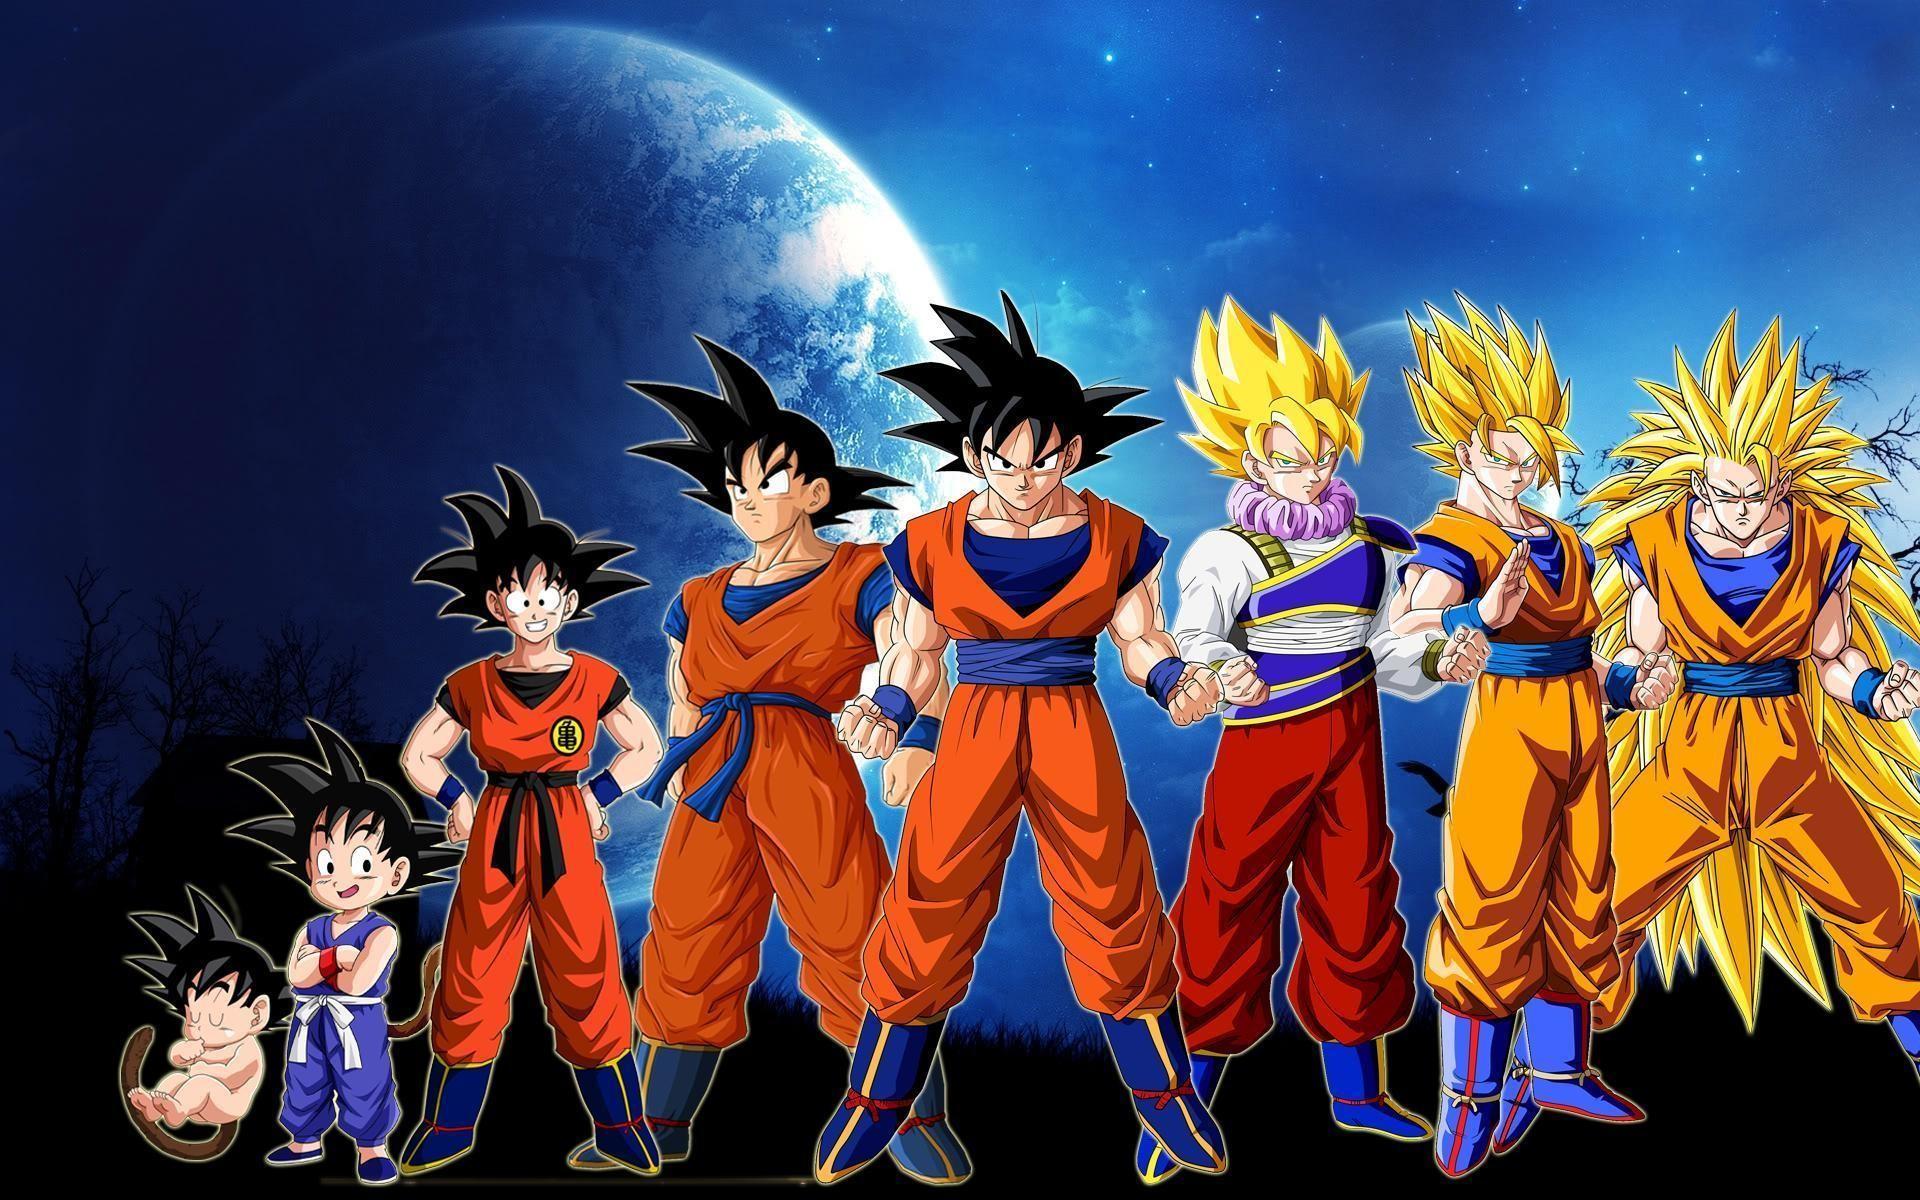 1920x1200 Dragon Ball Z Goku Story Wallpaper For Iphone | Cartoons Images · Download · Dragon Ball Z Wallpaper 34084